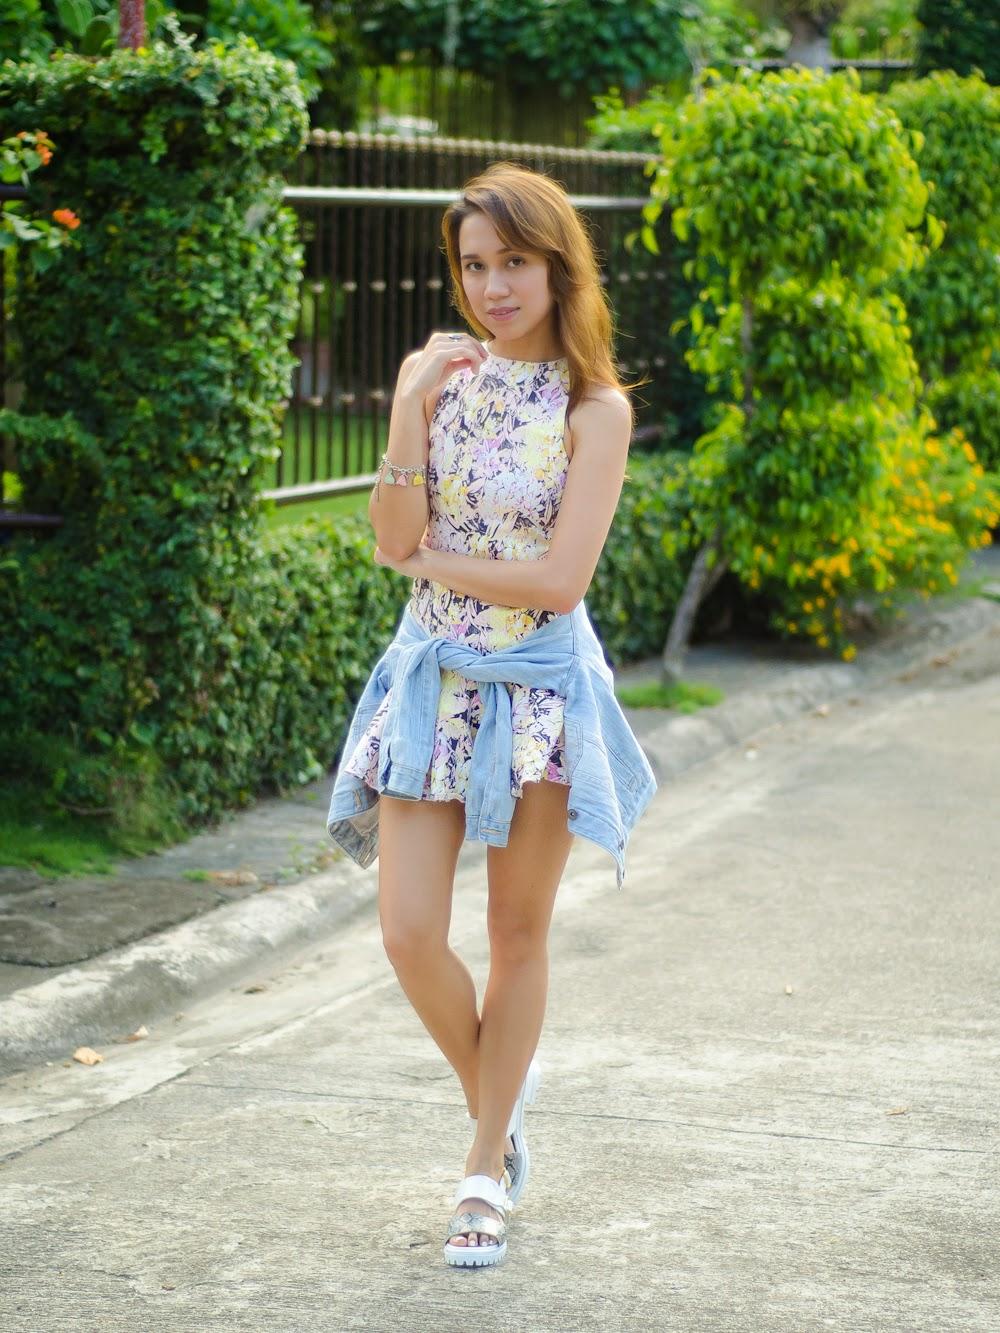 Girls in mini dresses images